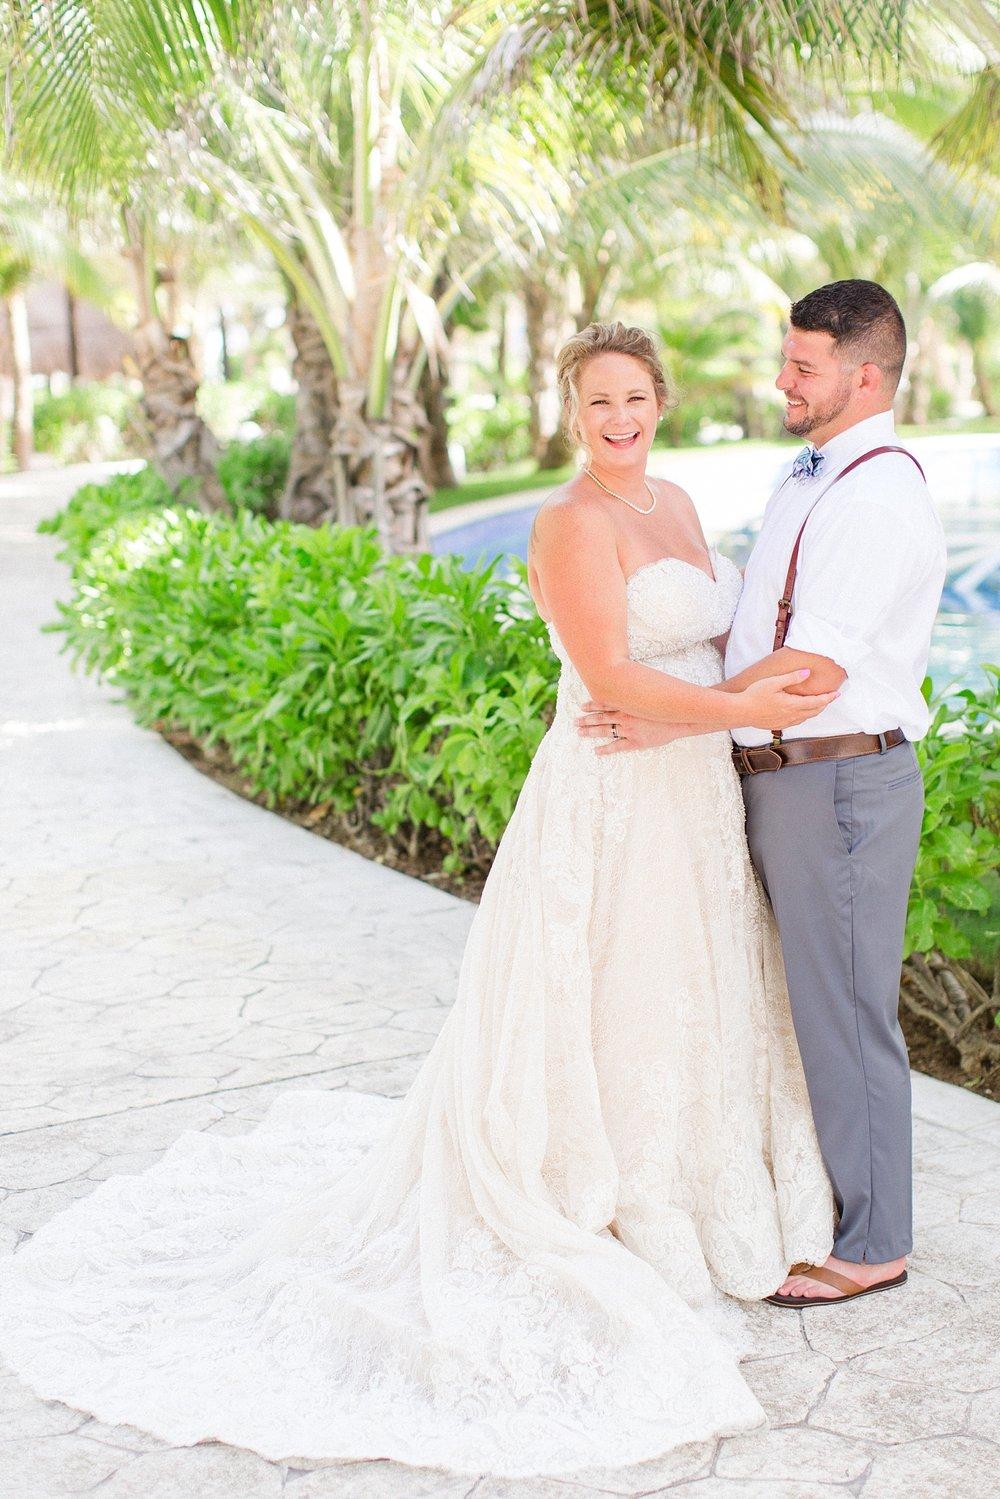 thevondys.com   El Dorado Royale Riviera Maya   Cancun   Destination Wedding Photographer   The Vondys